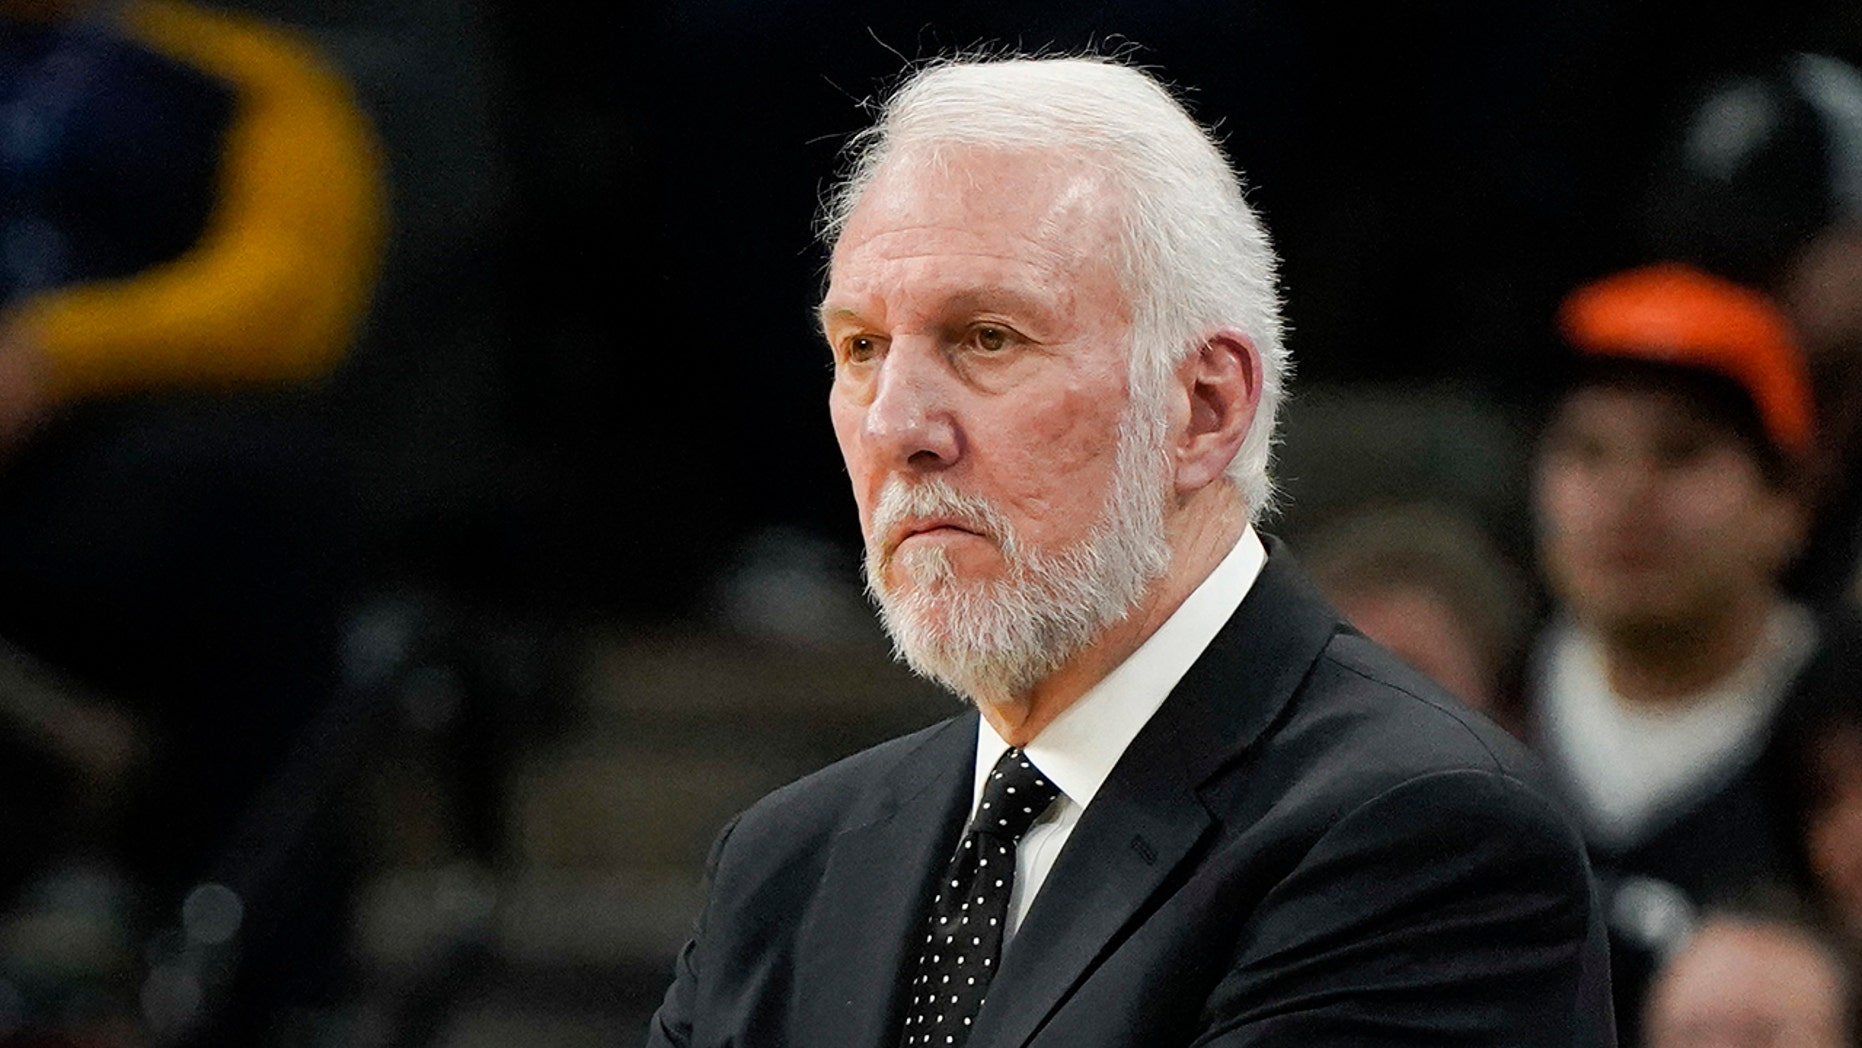 San Antonio Spurs head coach Gregg Popovich said he would support Beto O'Rourke in his Senate race against Ted Cruz.